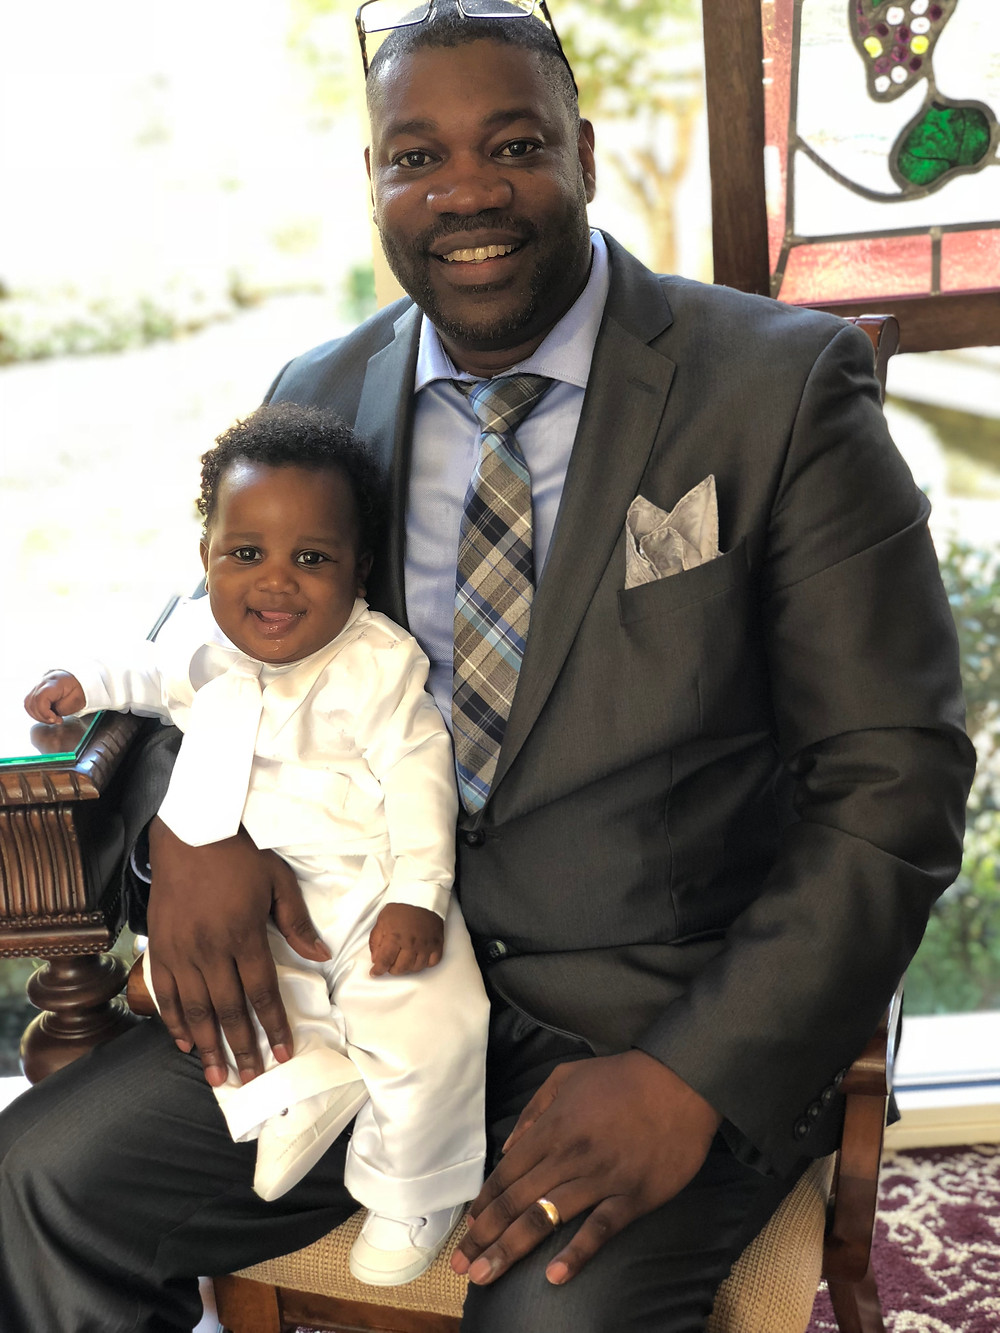 Introducing my son Israel Kukiriza Nkugwa the 3rd